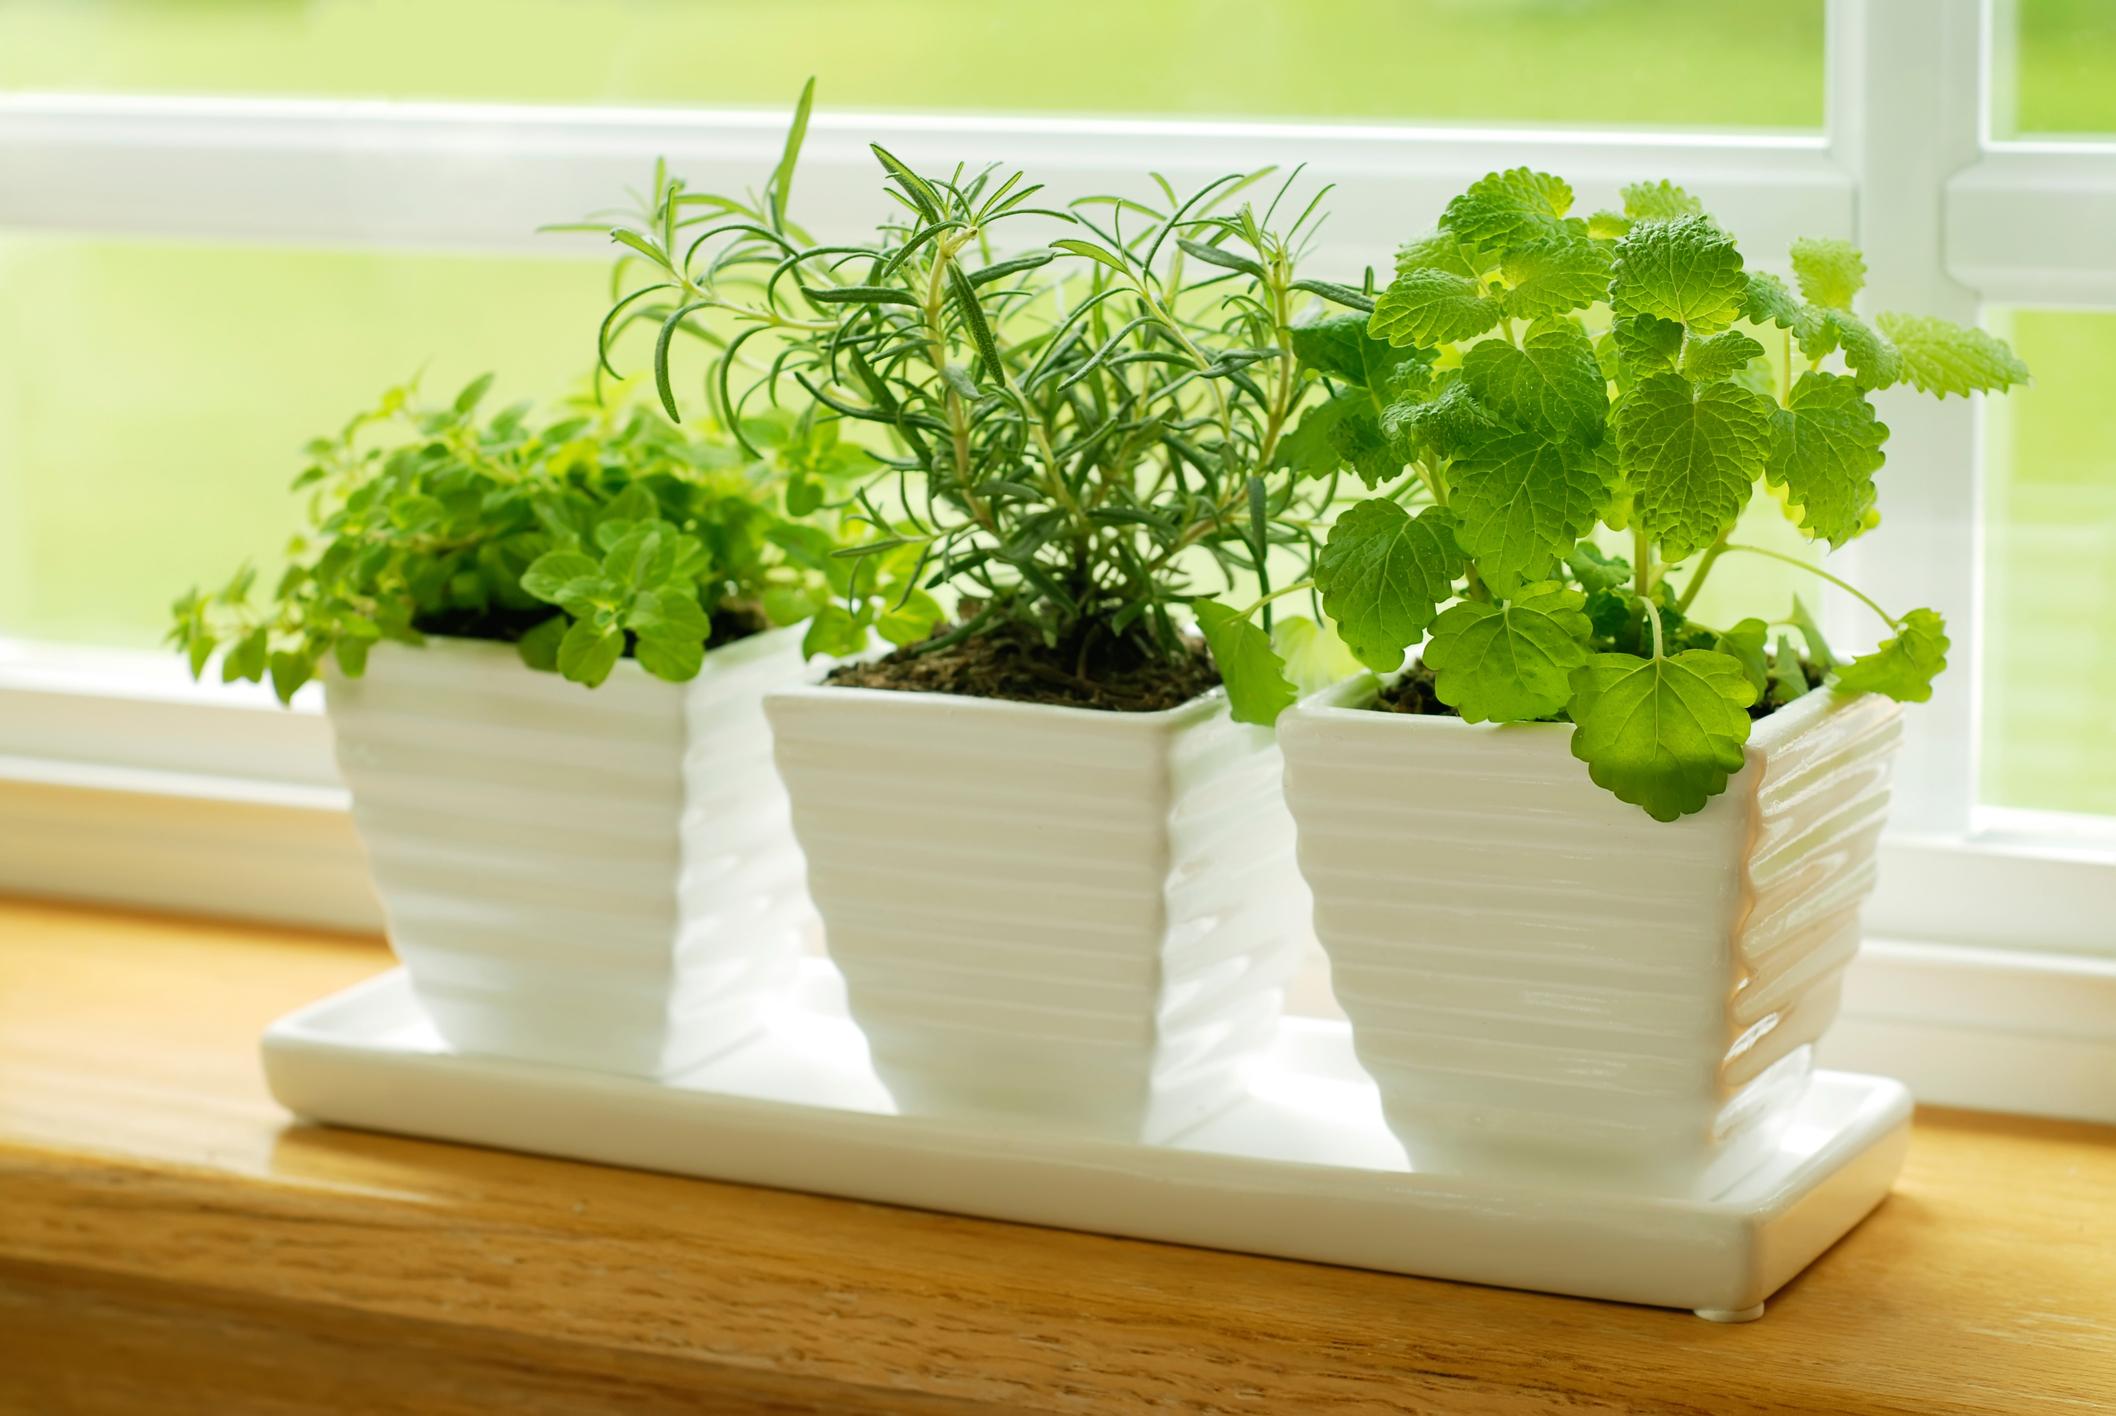 Green herbs on a window sill